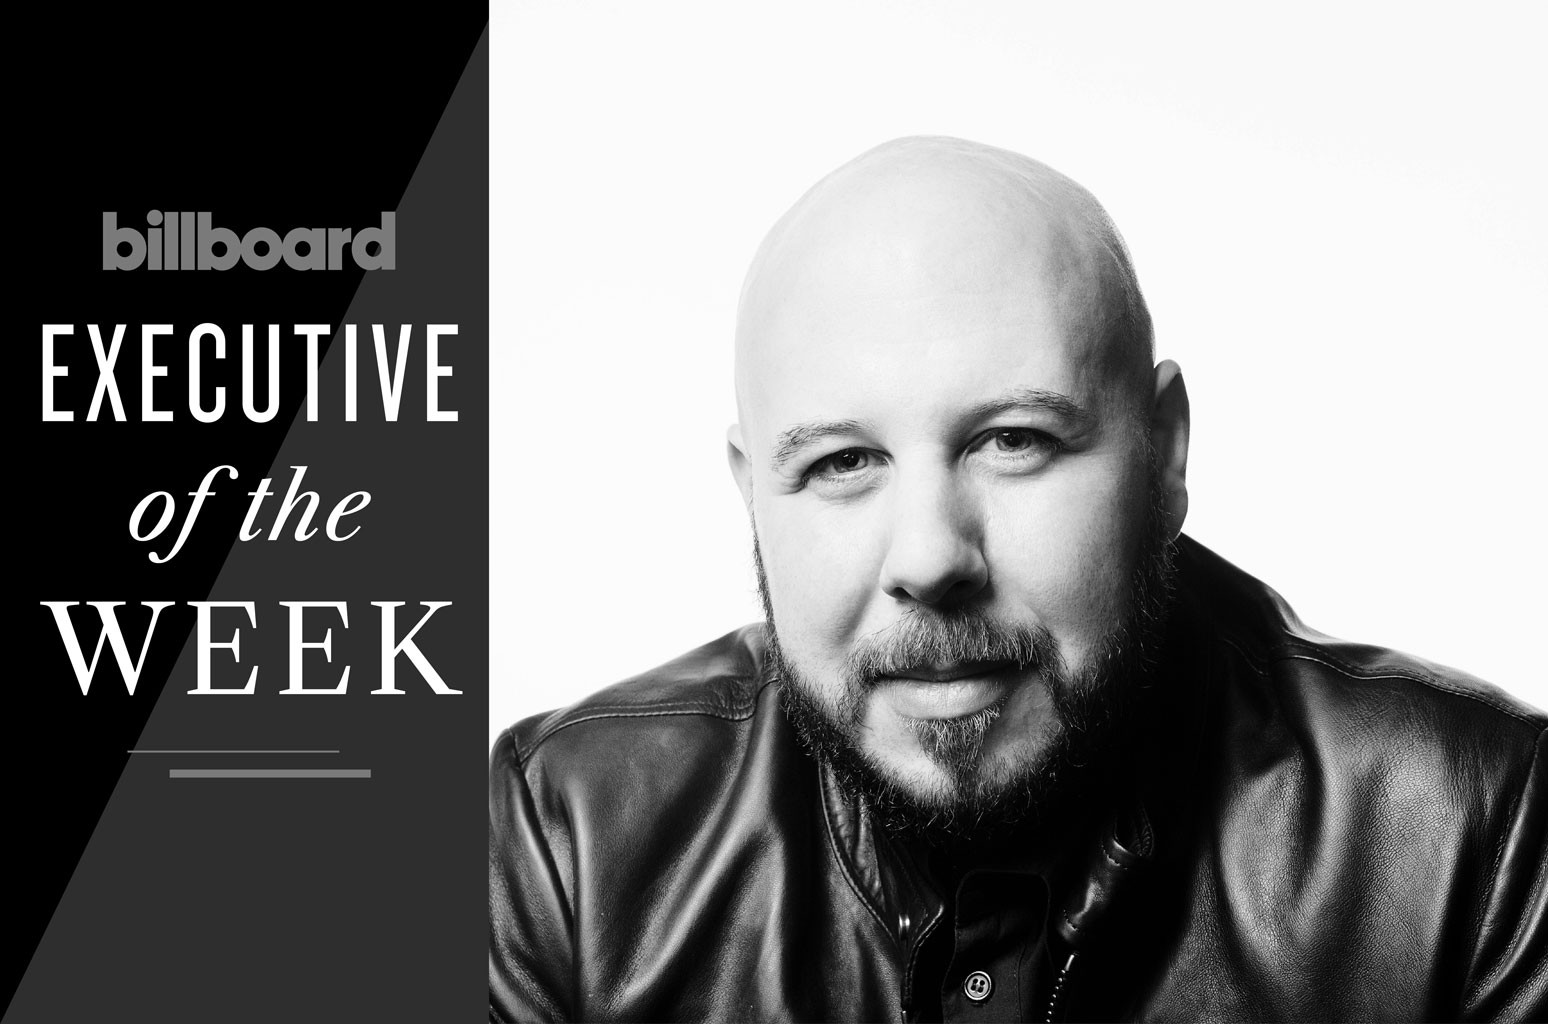 Executive of the Week: Rebel Founder/CEO Adam Leber